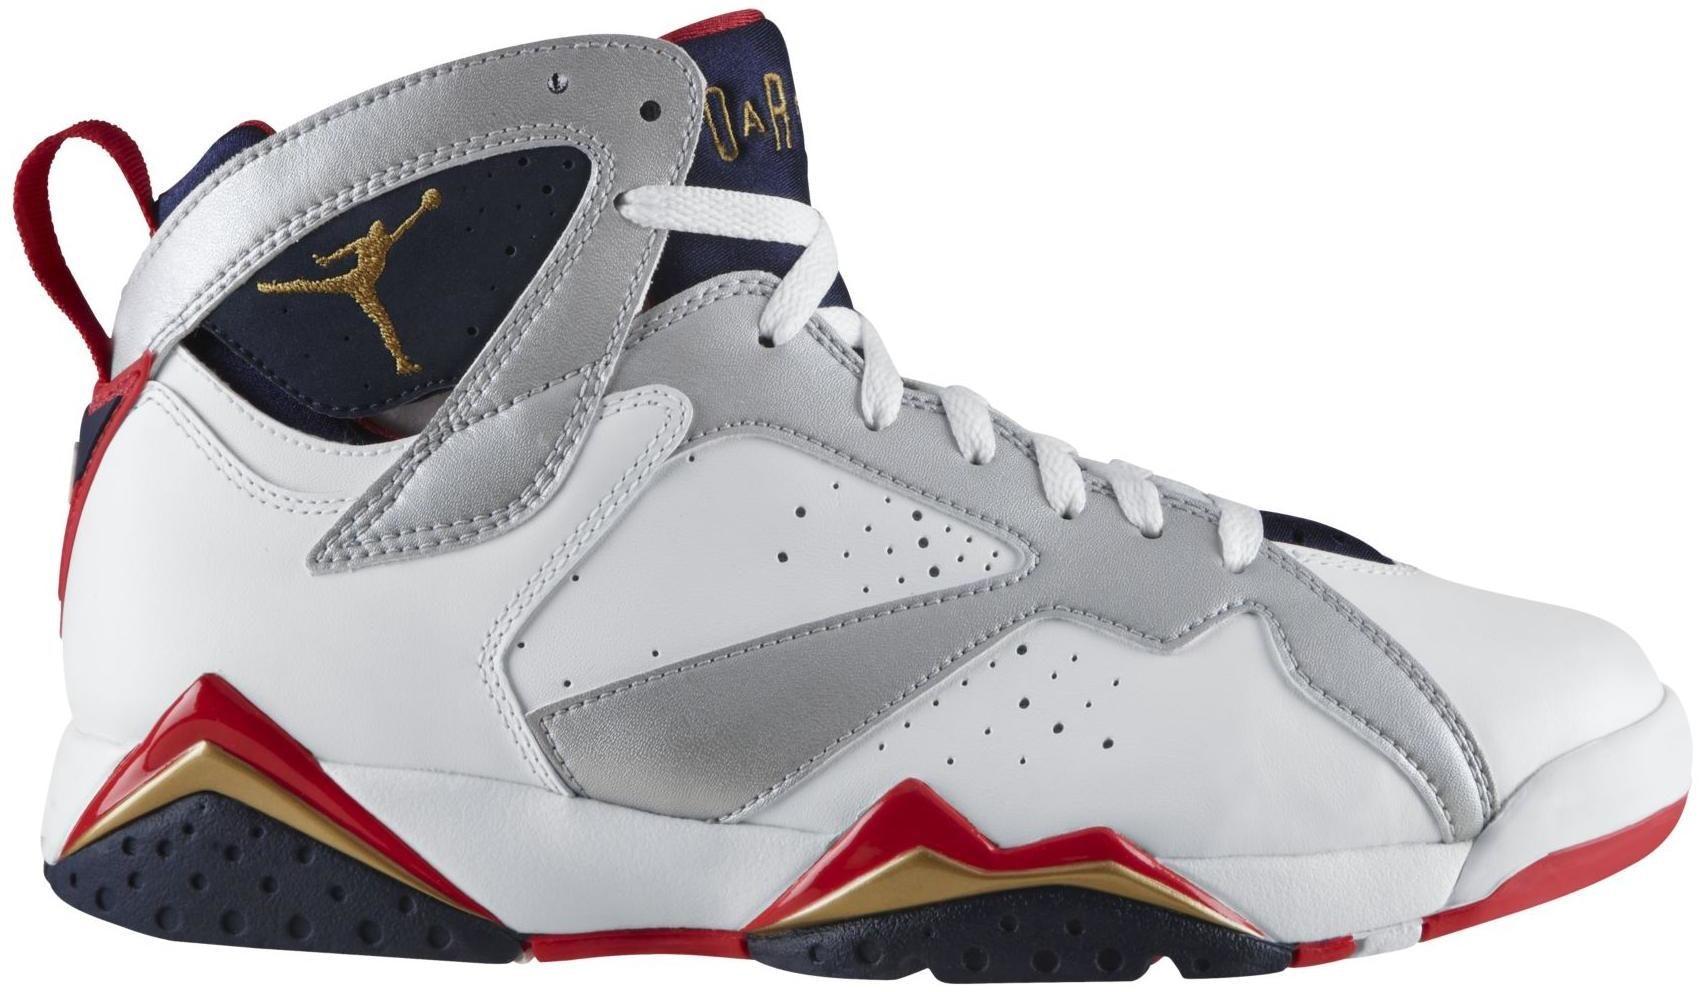 Jordan 7 Retro Olympic (2012)